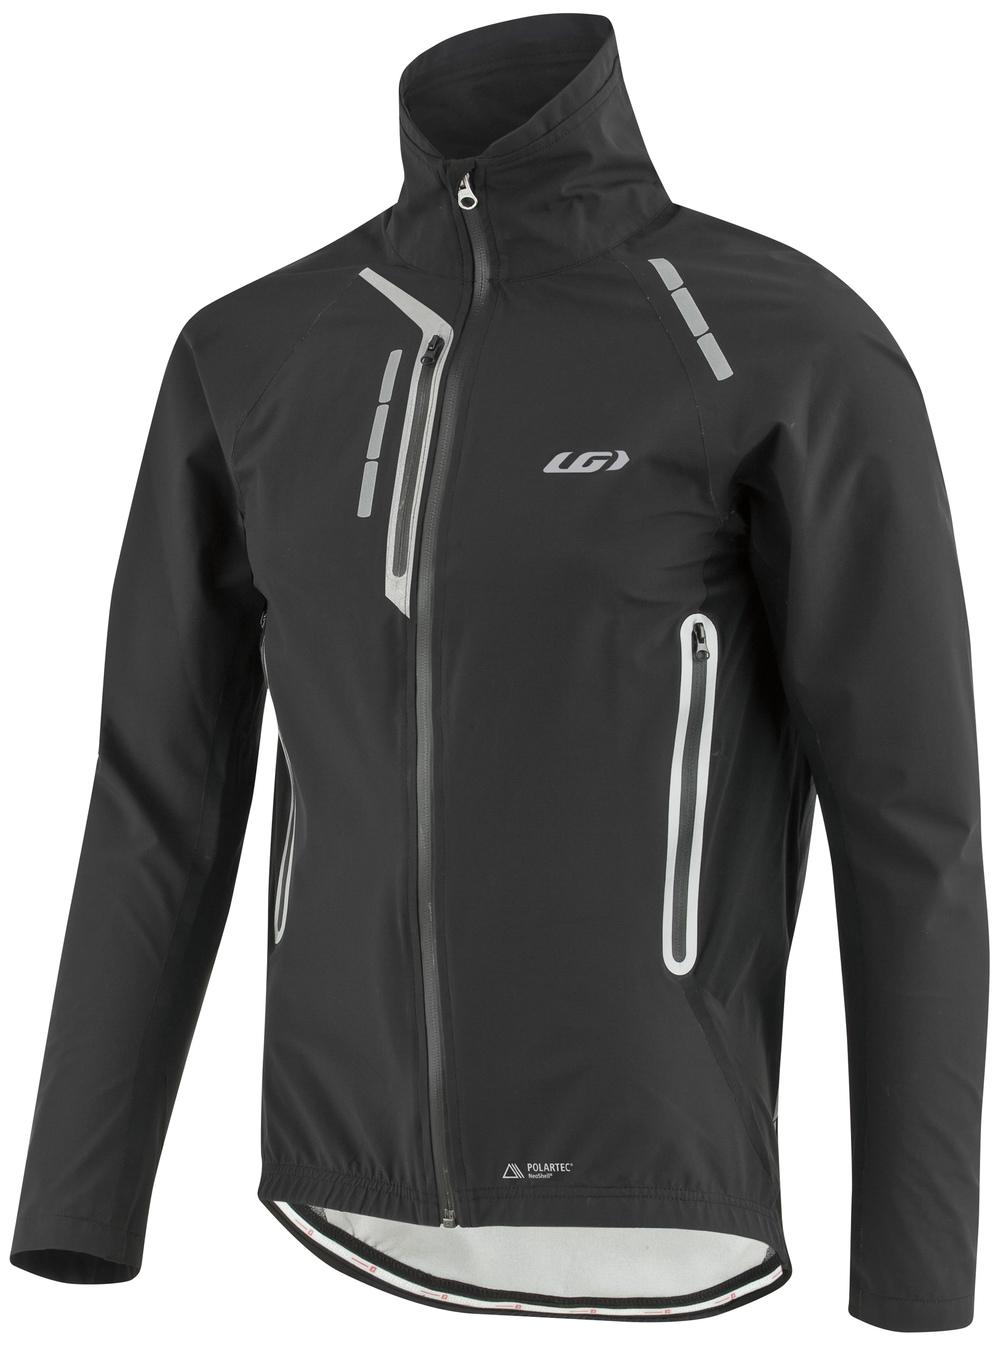 Louis Garneau NeoShell® Cycling Jacket, $280